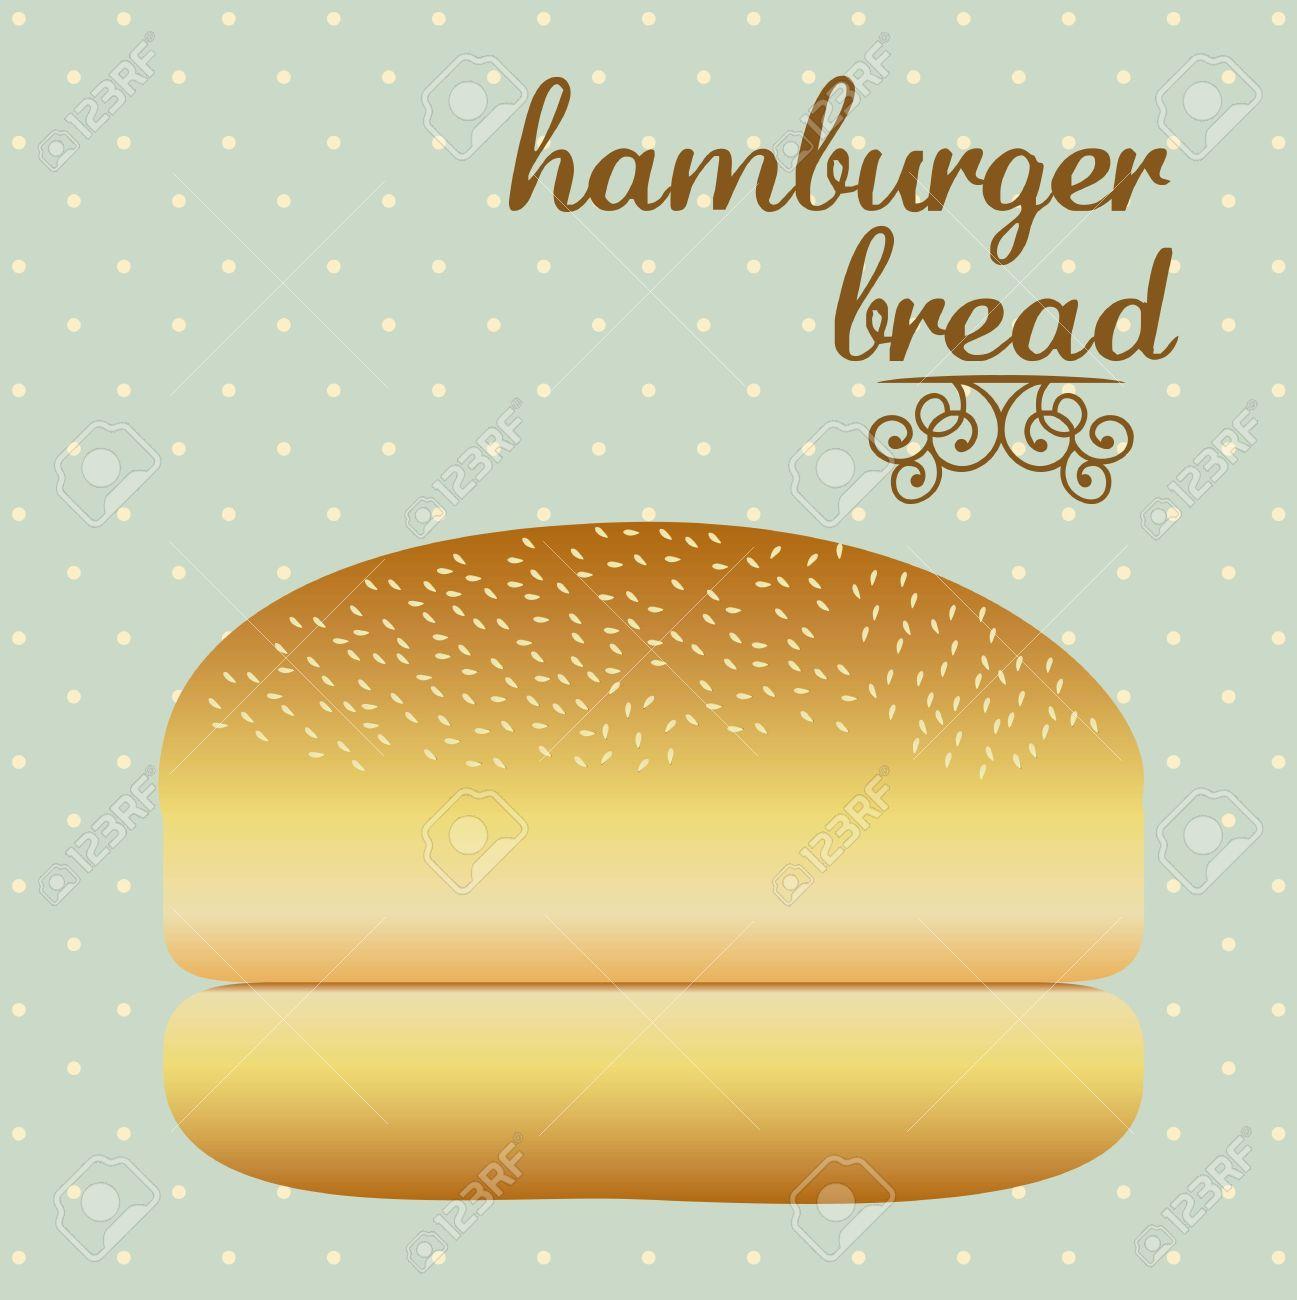 Illustration of hamburger bread, bakery icon, vector illustration Stock Vector - 17002552